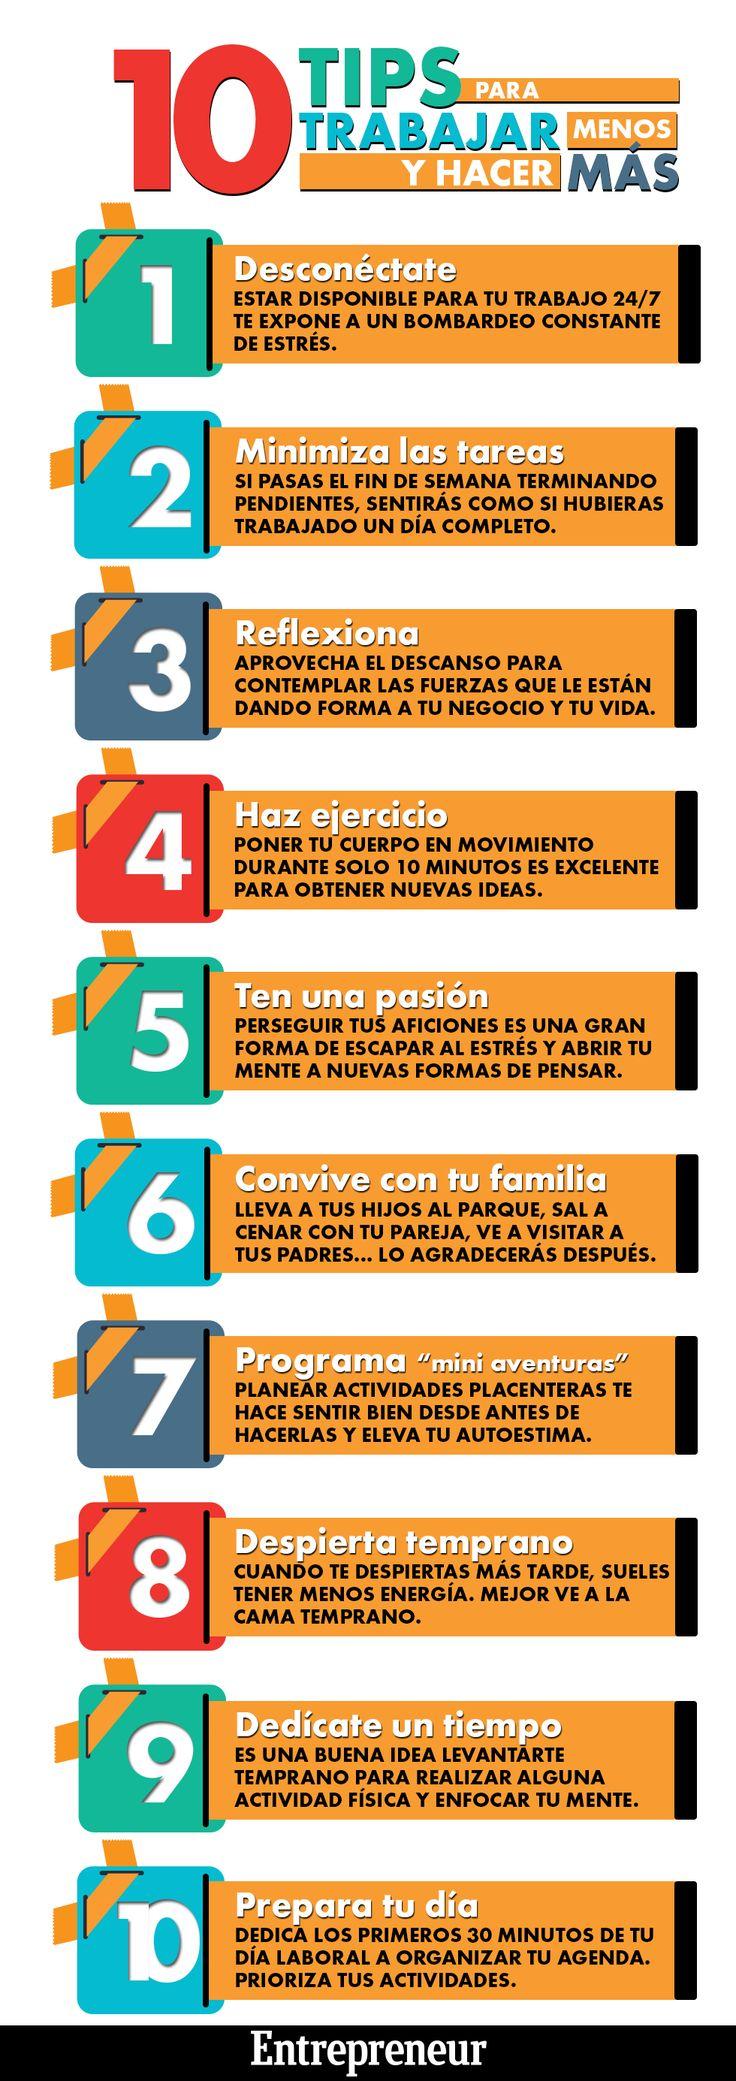 Más información en ▶️ http://prixline.wordpress.com/contacto  o por WhatsApp +34 668 802 743 #prixline #Curso #Aprender